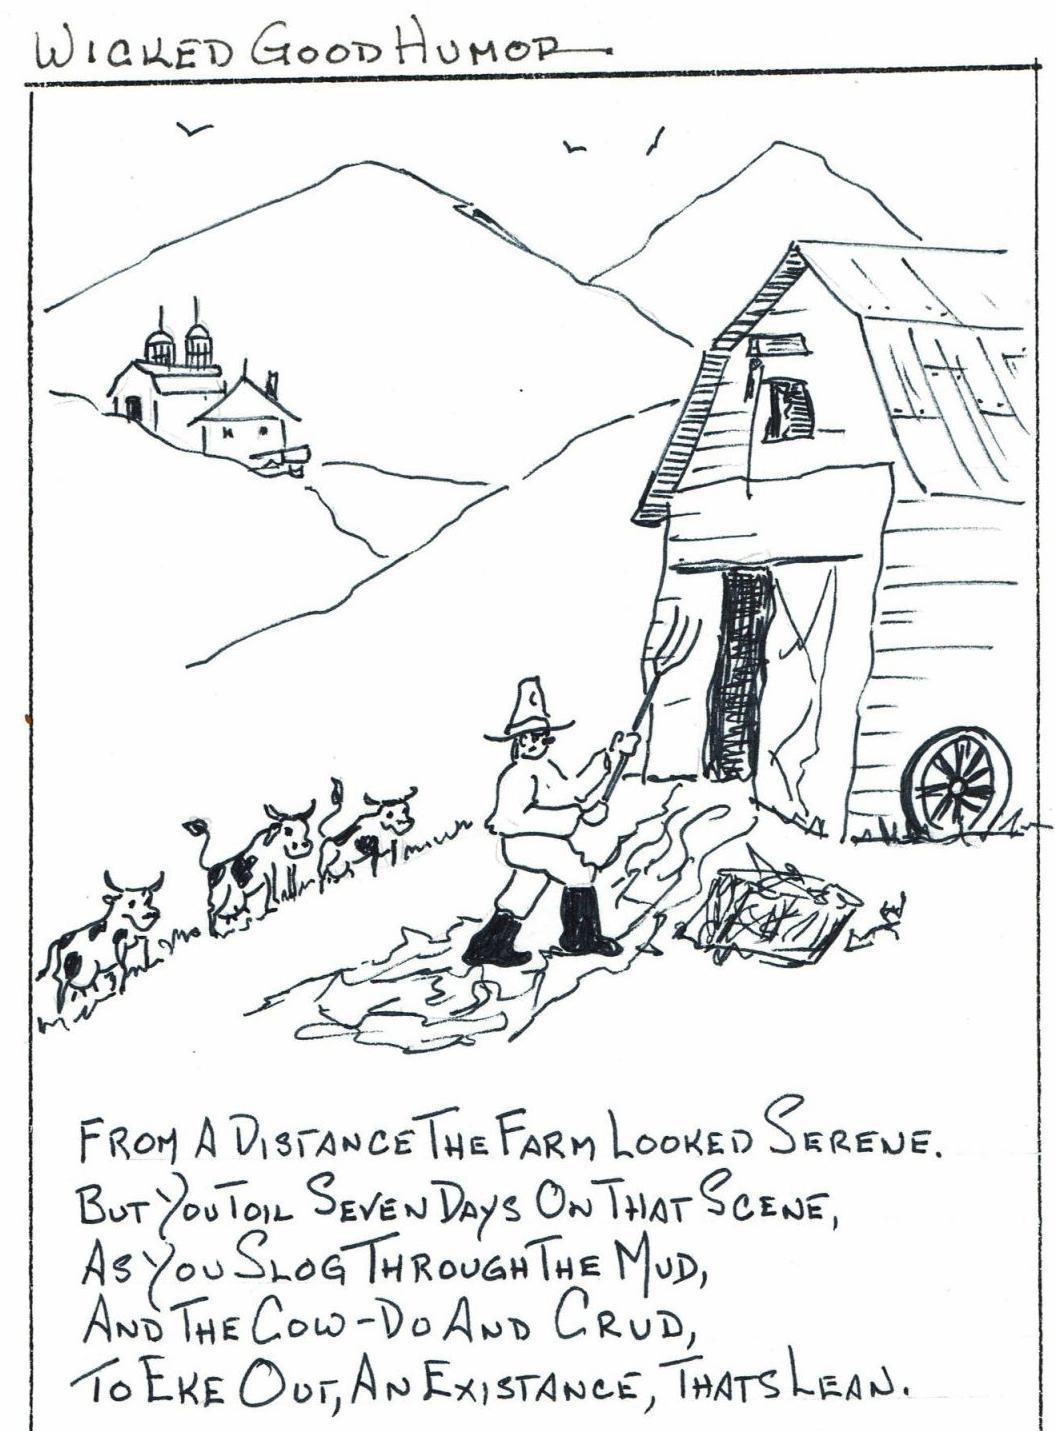 Skip Sedore - farming